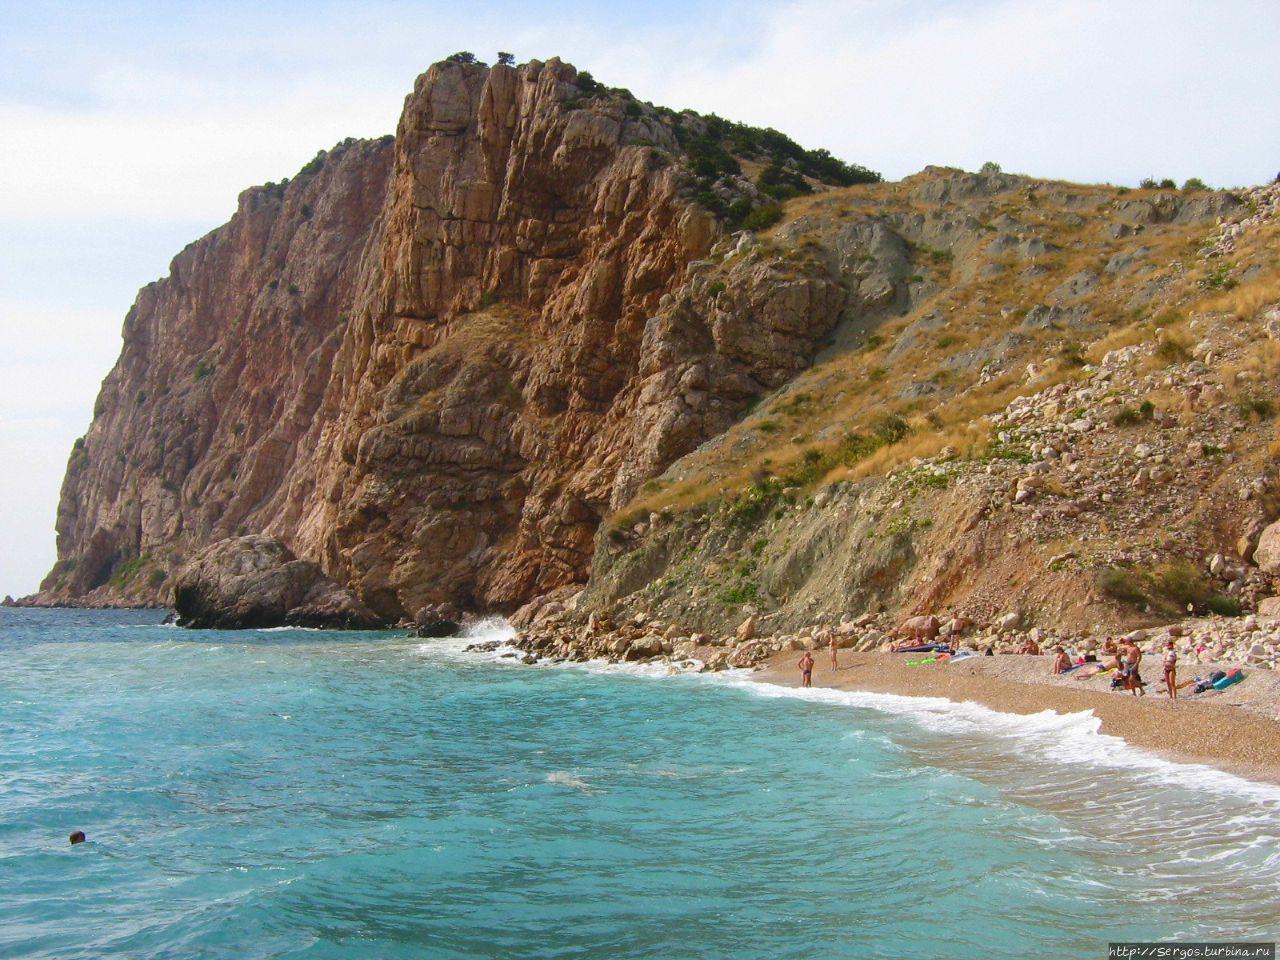 Балаклава пляжи дикие фото